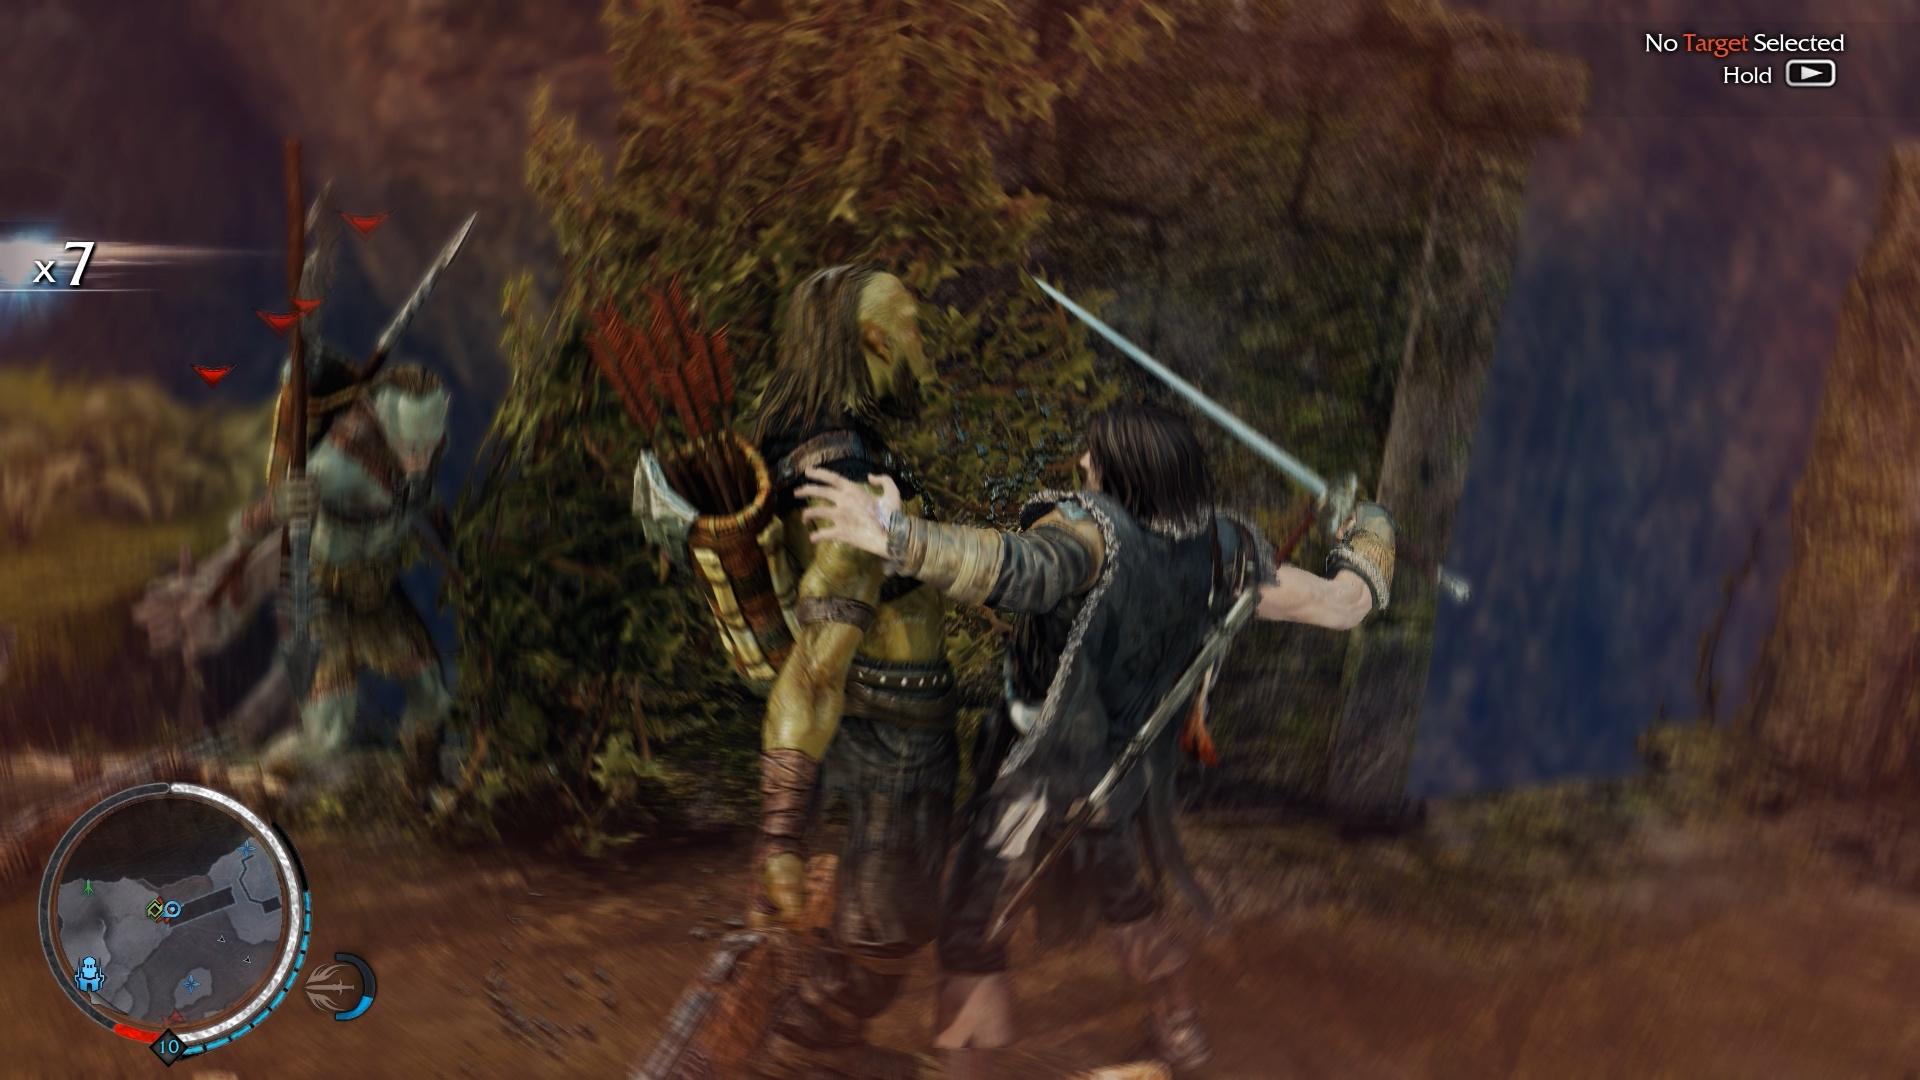 Shasdow of Mordor 3